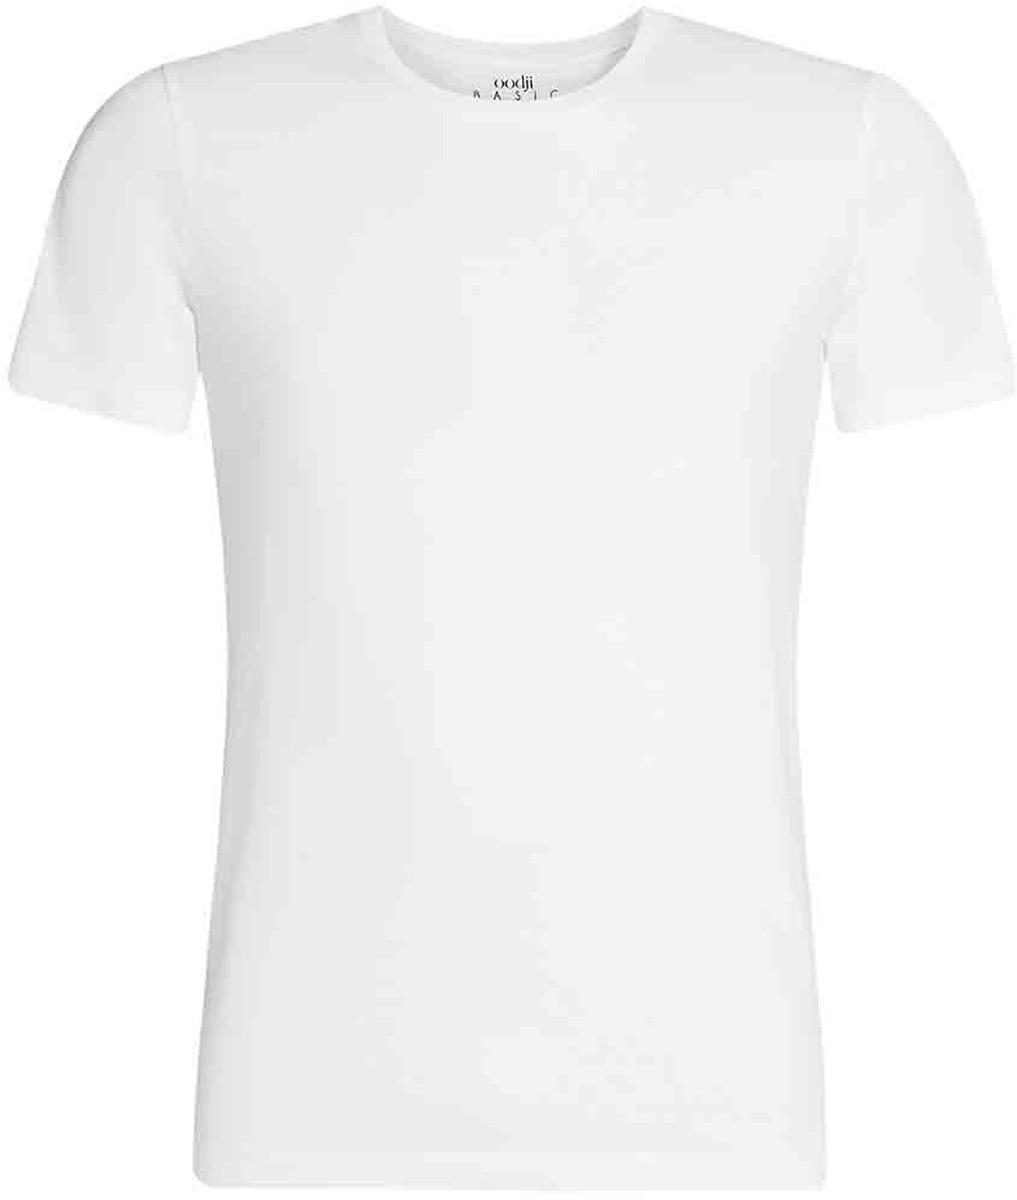 Футболка мужская oodji Basic, цвет: белый. 5B611003M/44135N/1000N. Размер XS (44)5B611003M/44135N/1000NКомфортная мужская футболка от oodji с короткими рукавами и круглым вырезом горловины выполнена из натурального хлопка.